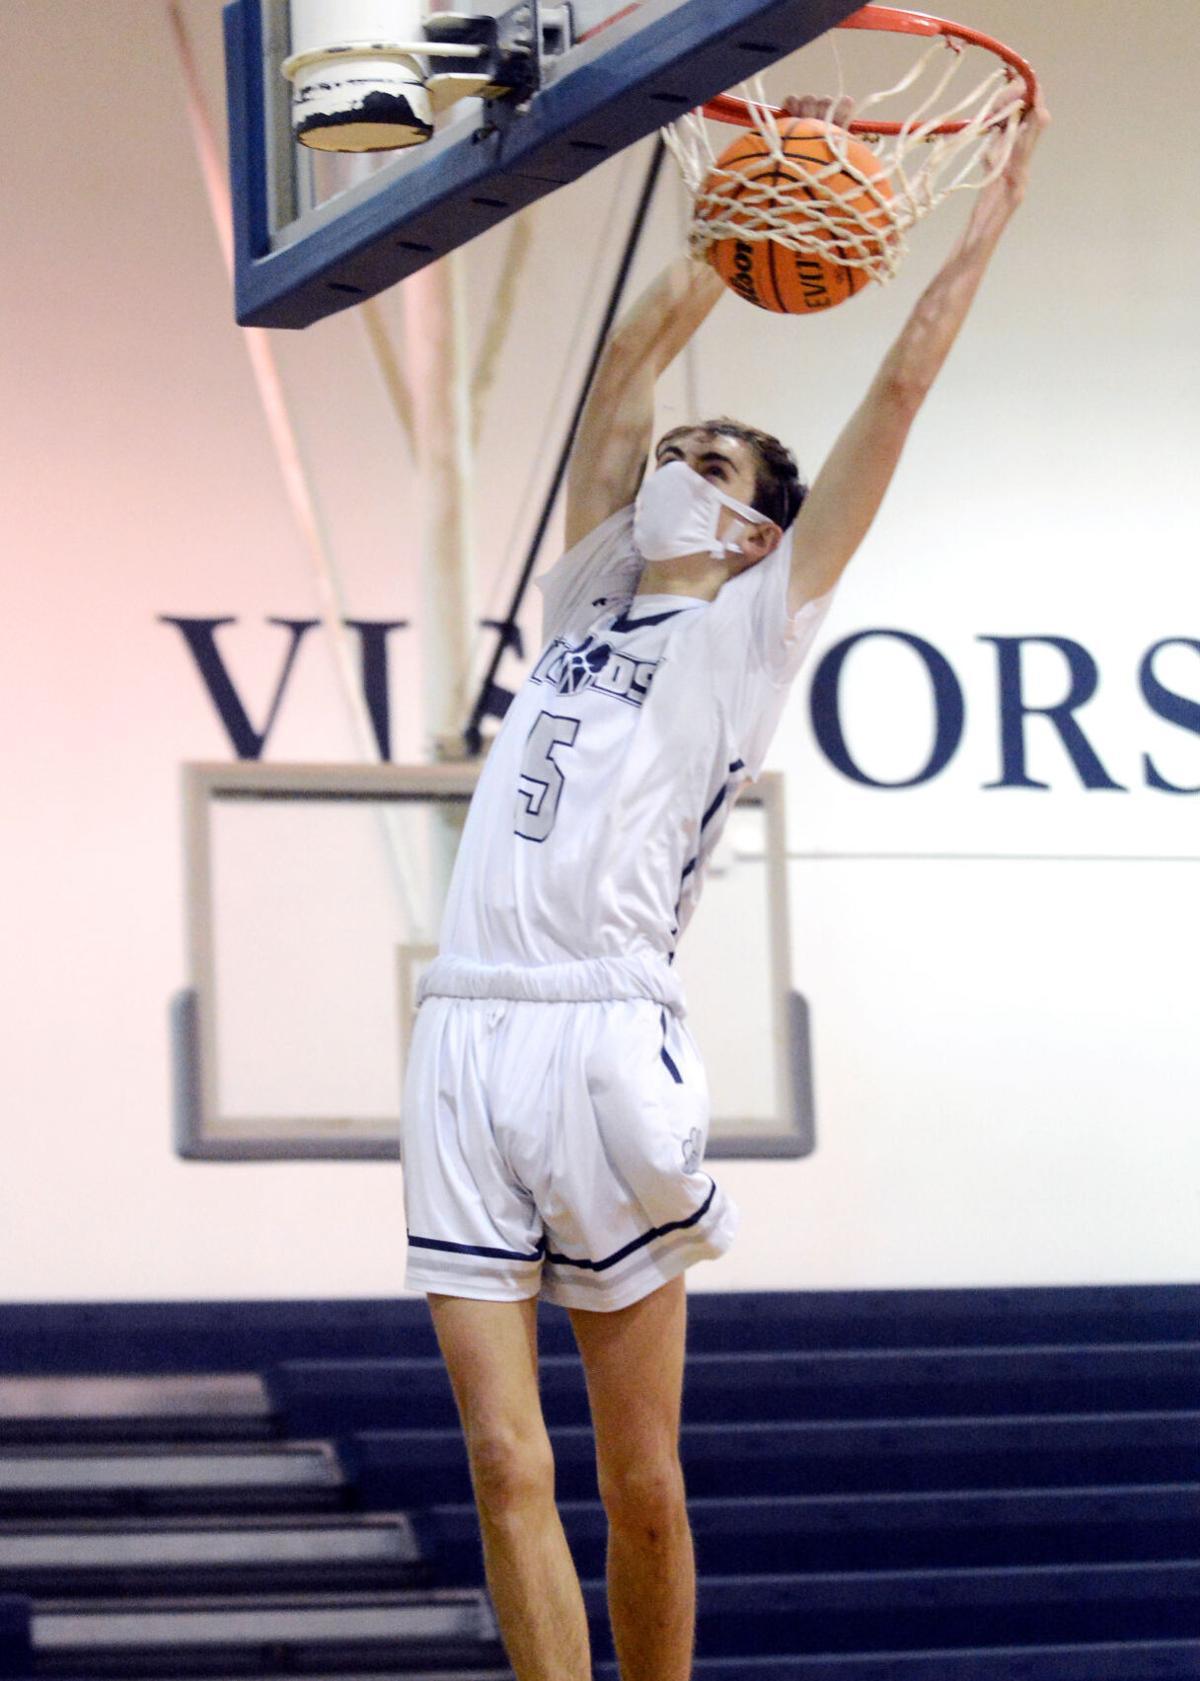 12-5-20 WCDS-North Hills boys basketball1.jpg